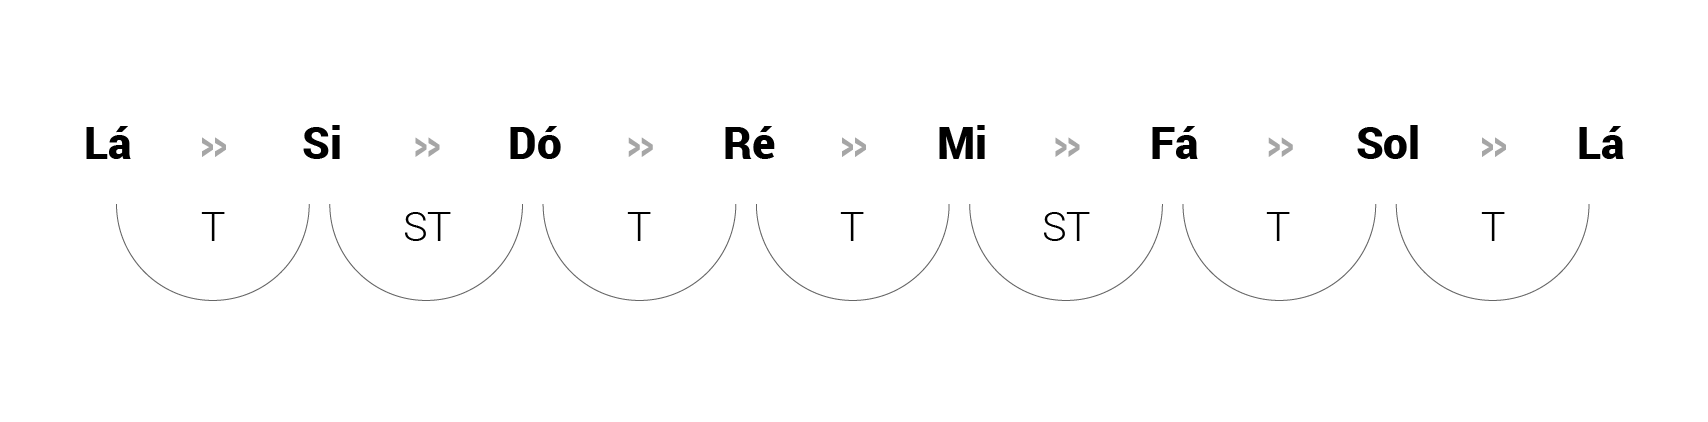 Modos Gregos: Tons e semitons da escala menor (Tônica: Lá)